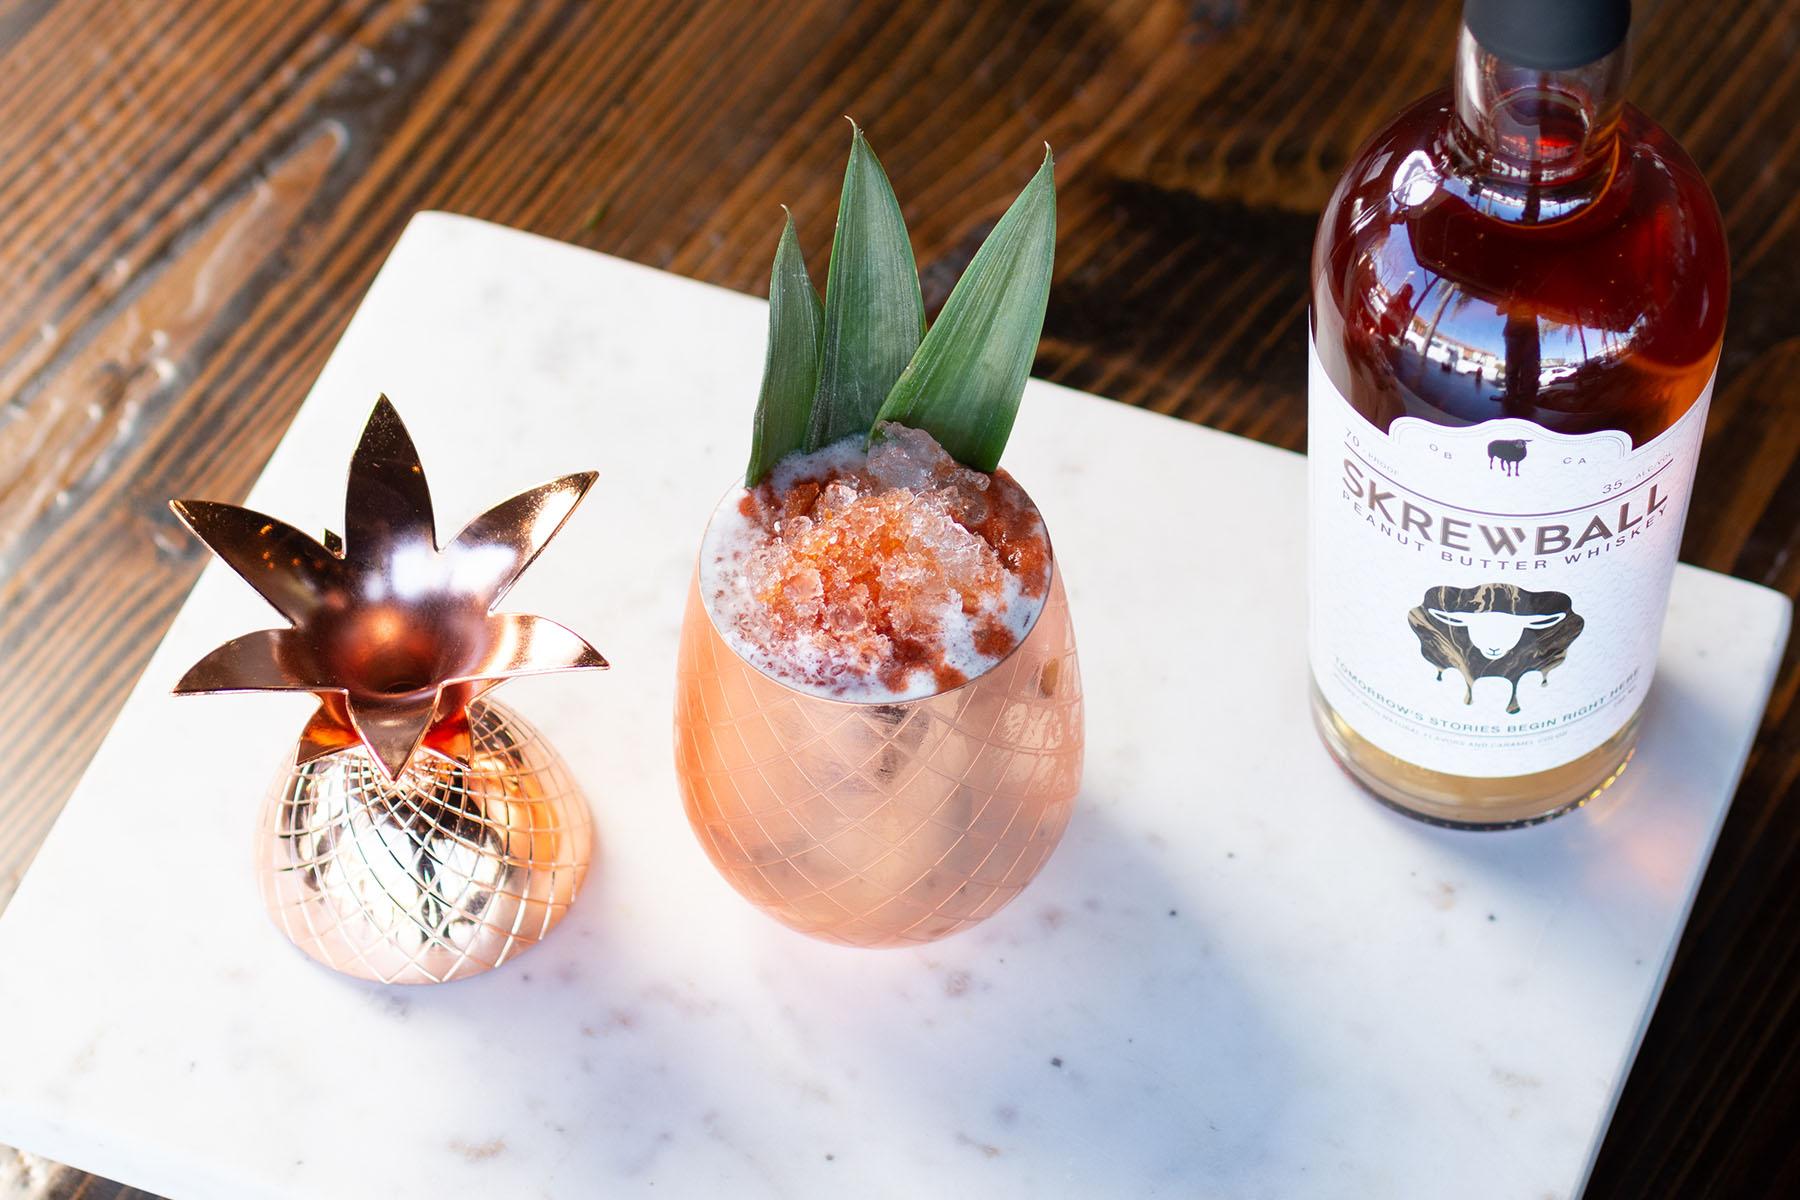 screwball cocktail